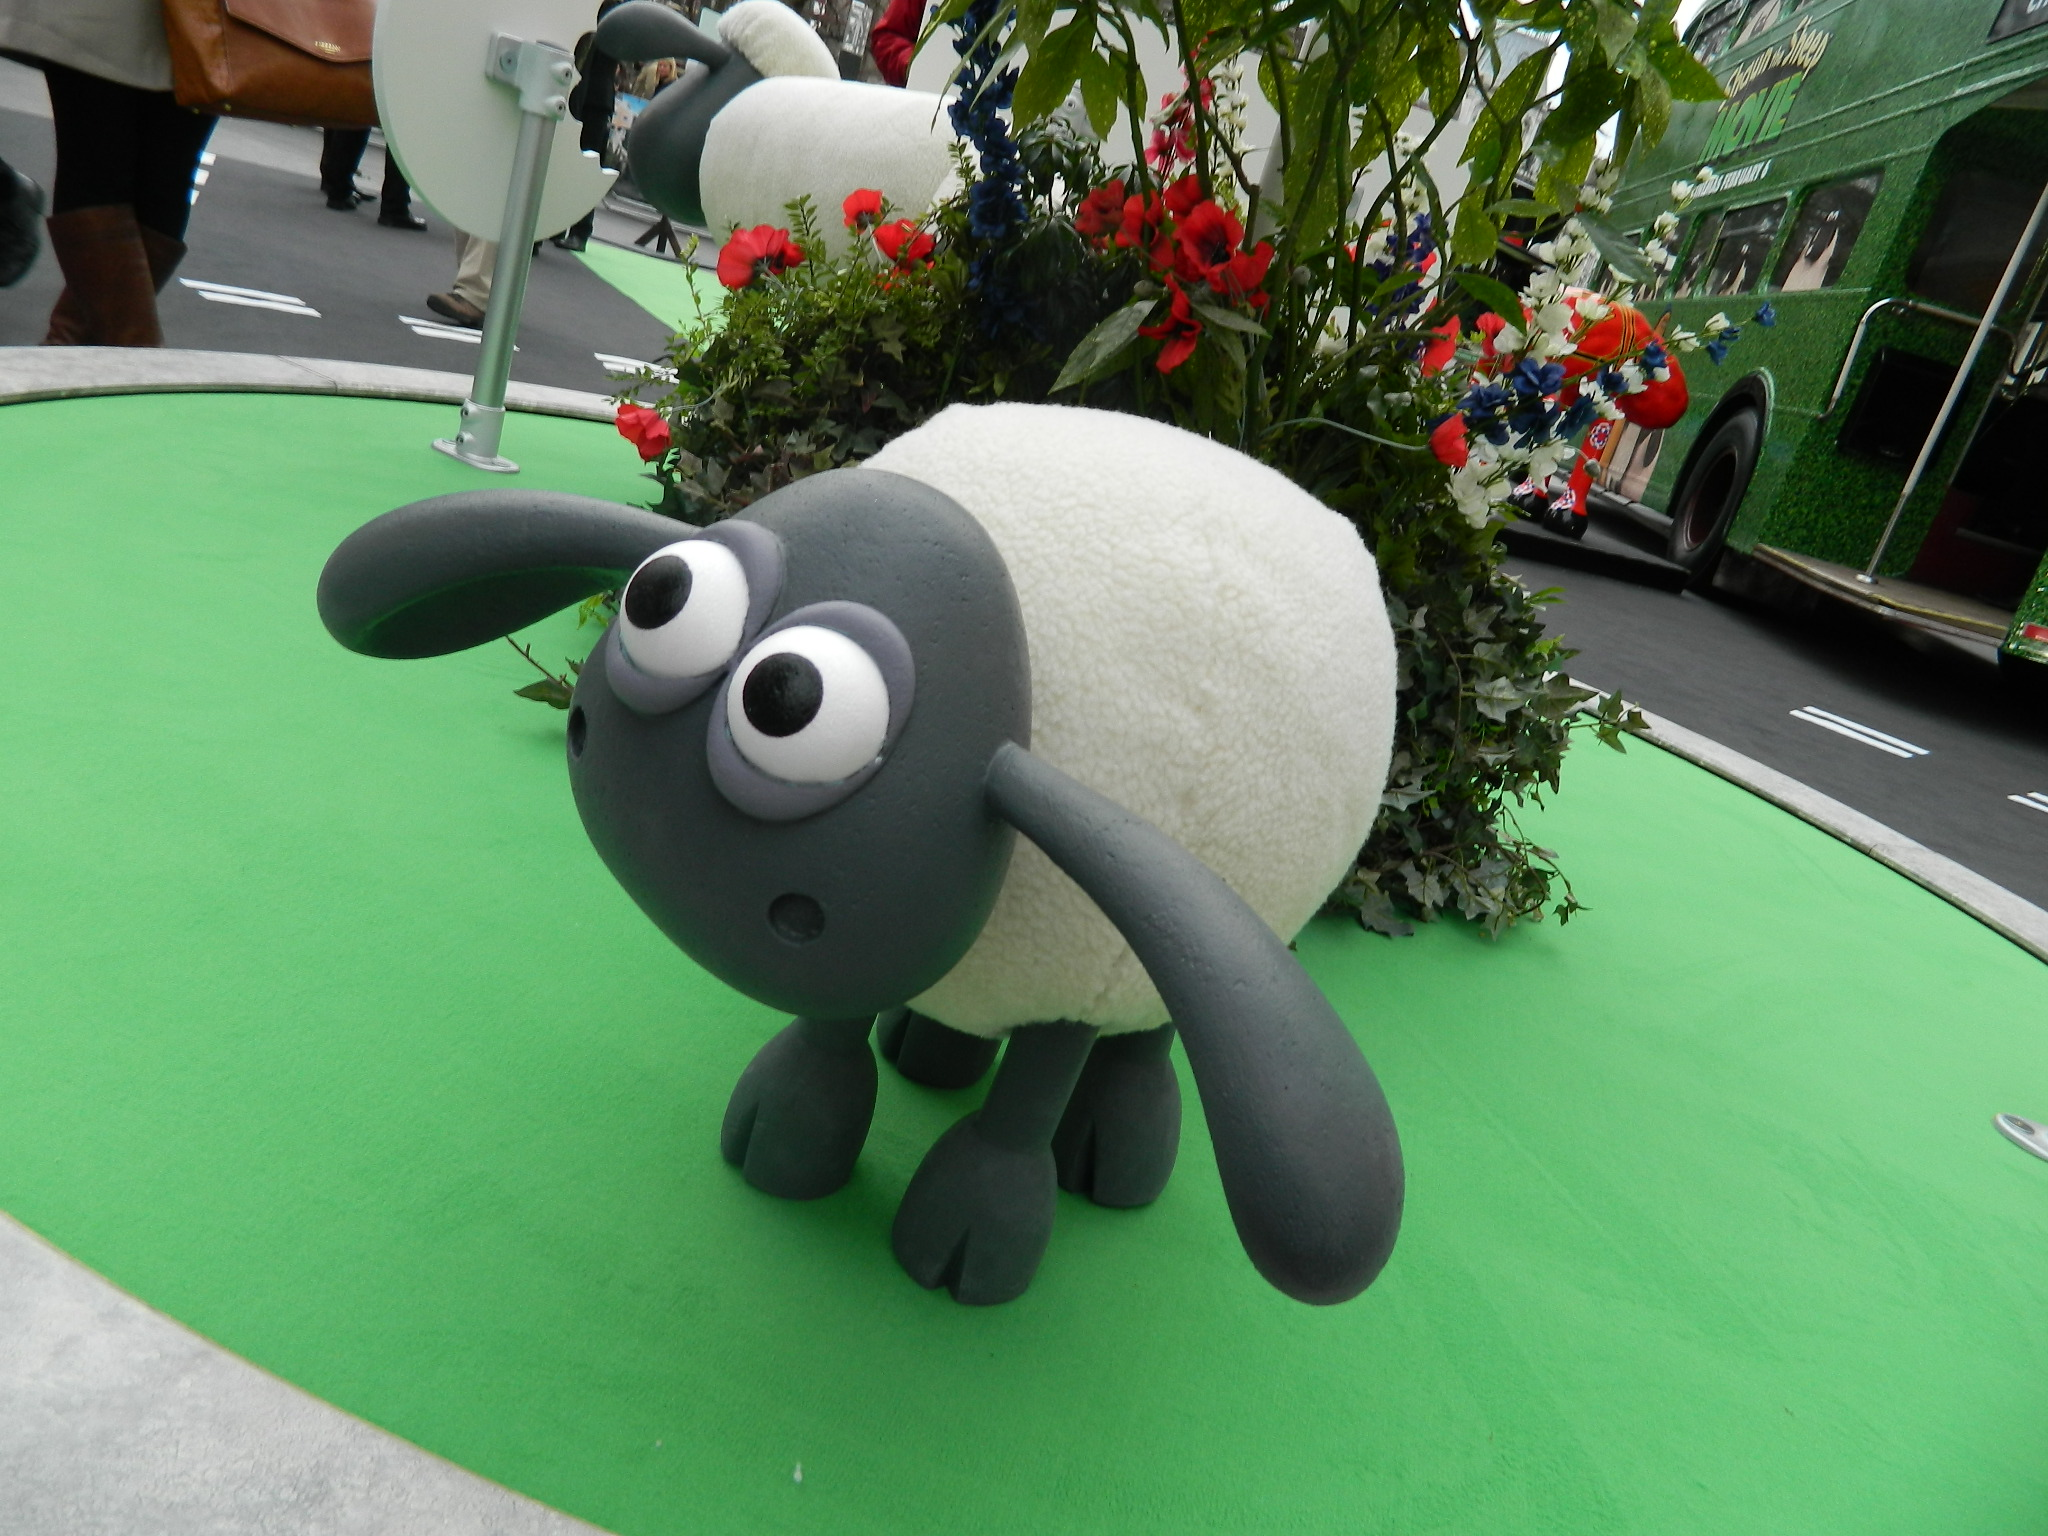 aardman shaun the sheep the movie � con meets the stars